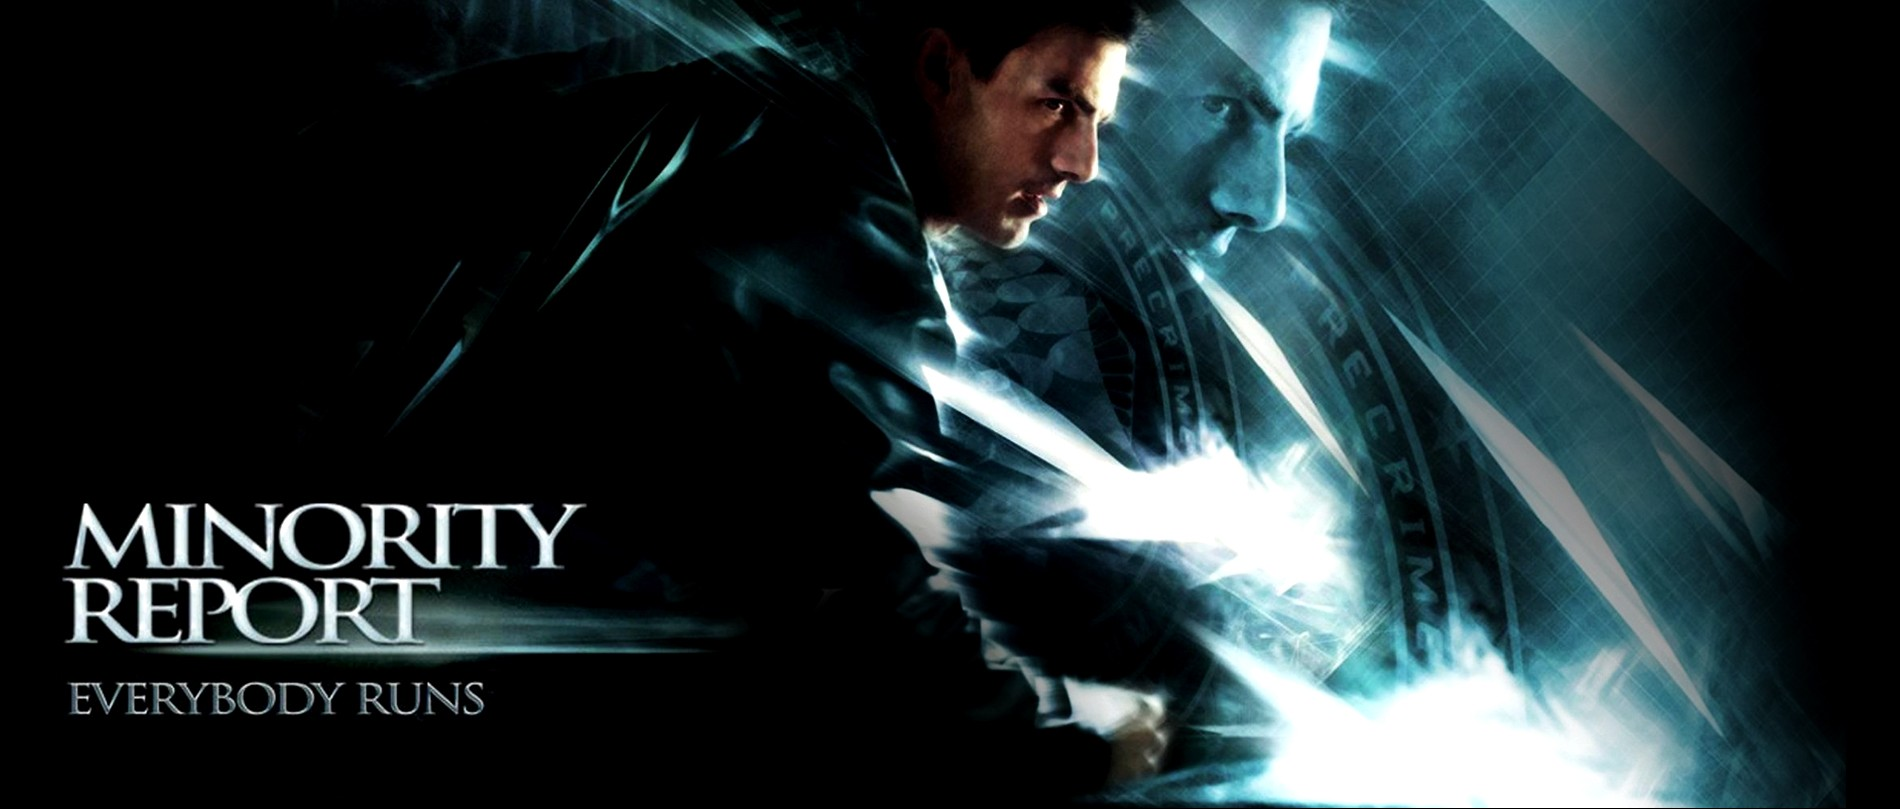 science-fiction-movies_v20